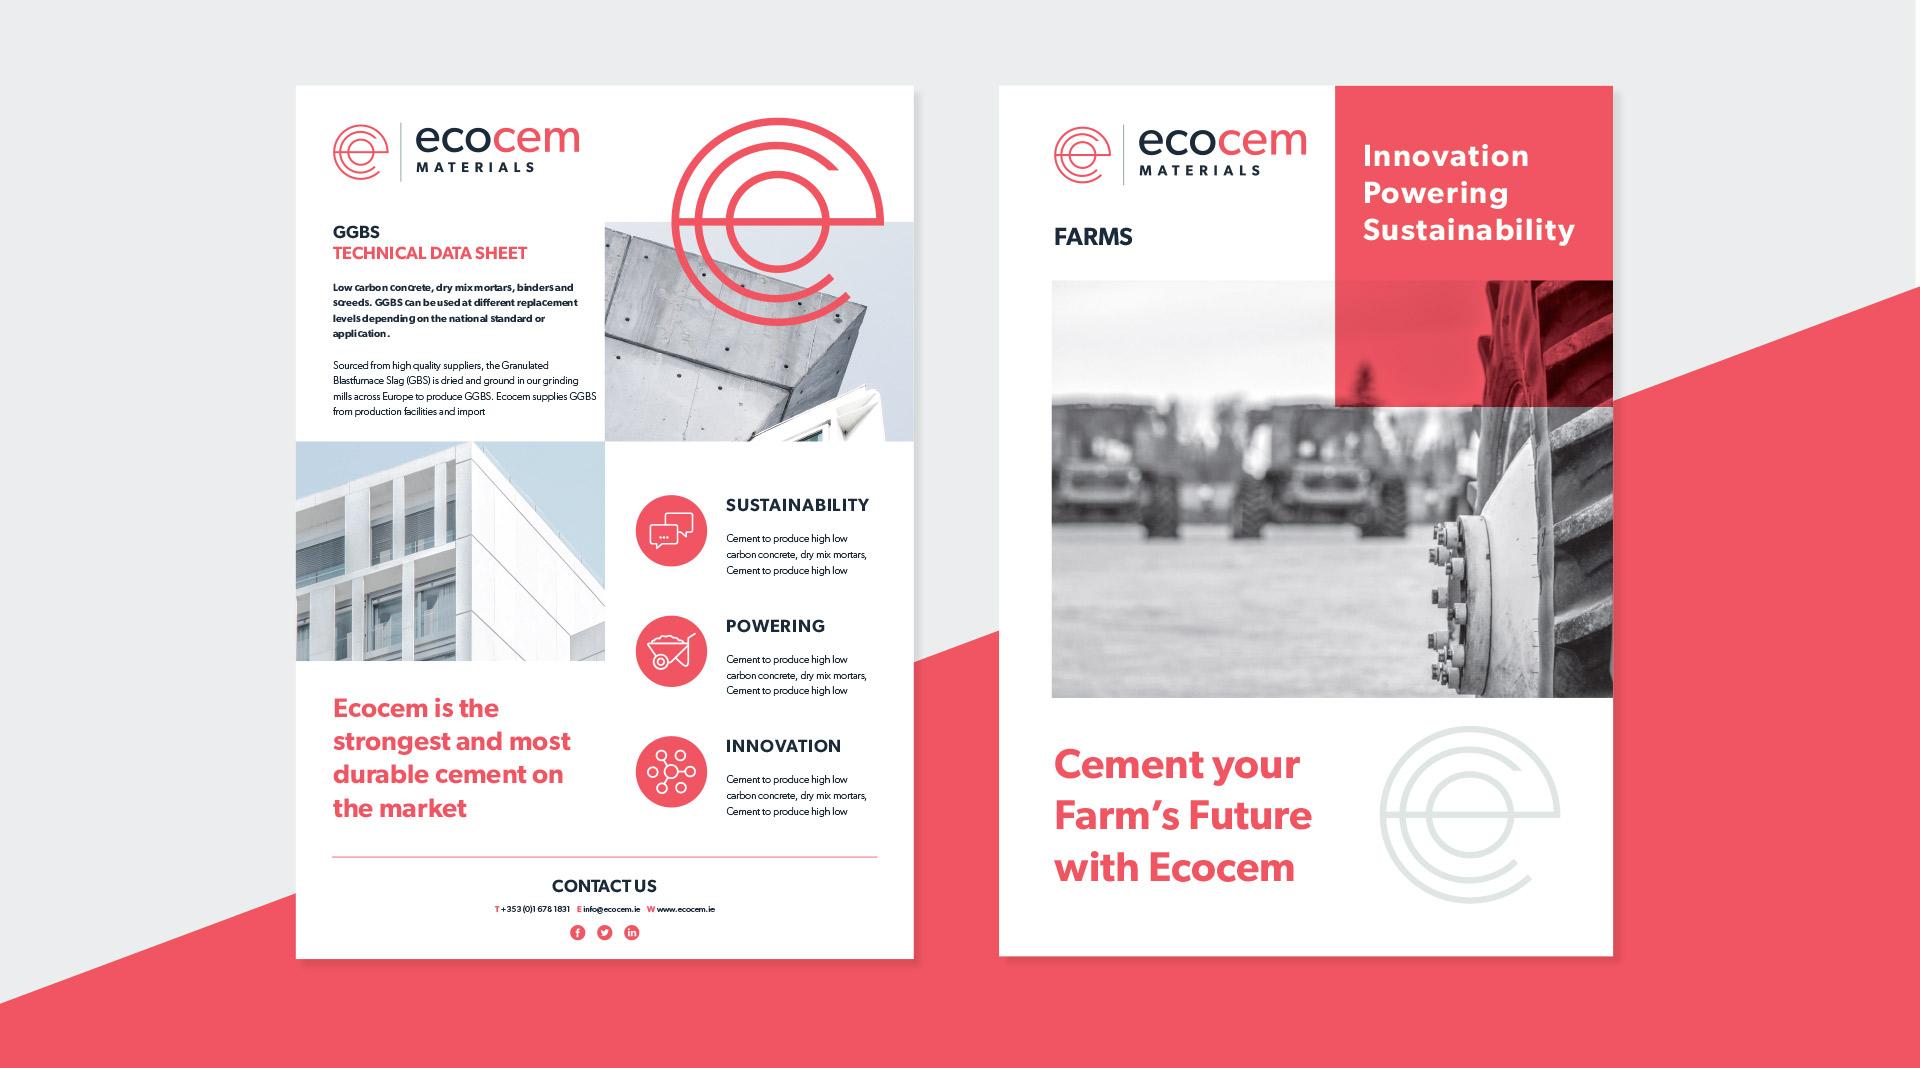 Ecocem materials design of brochure and data sheets